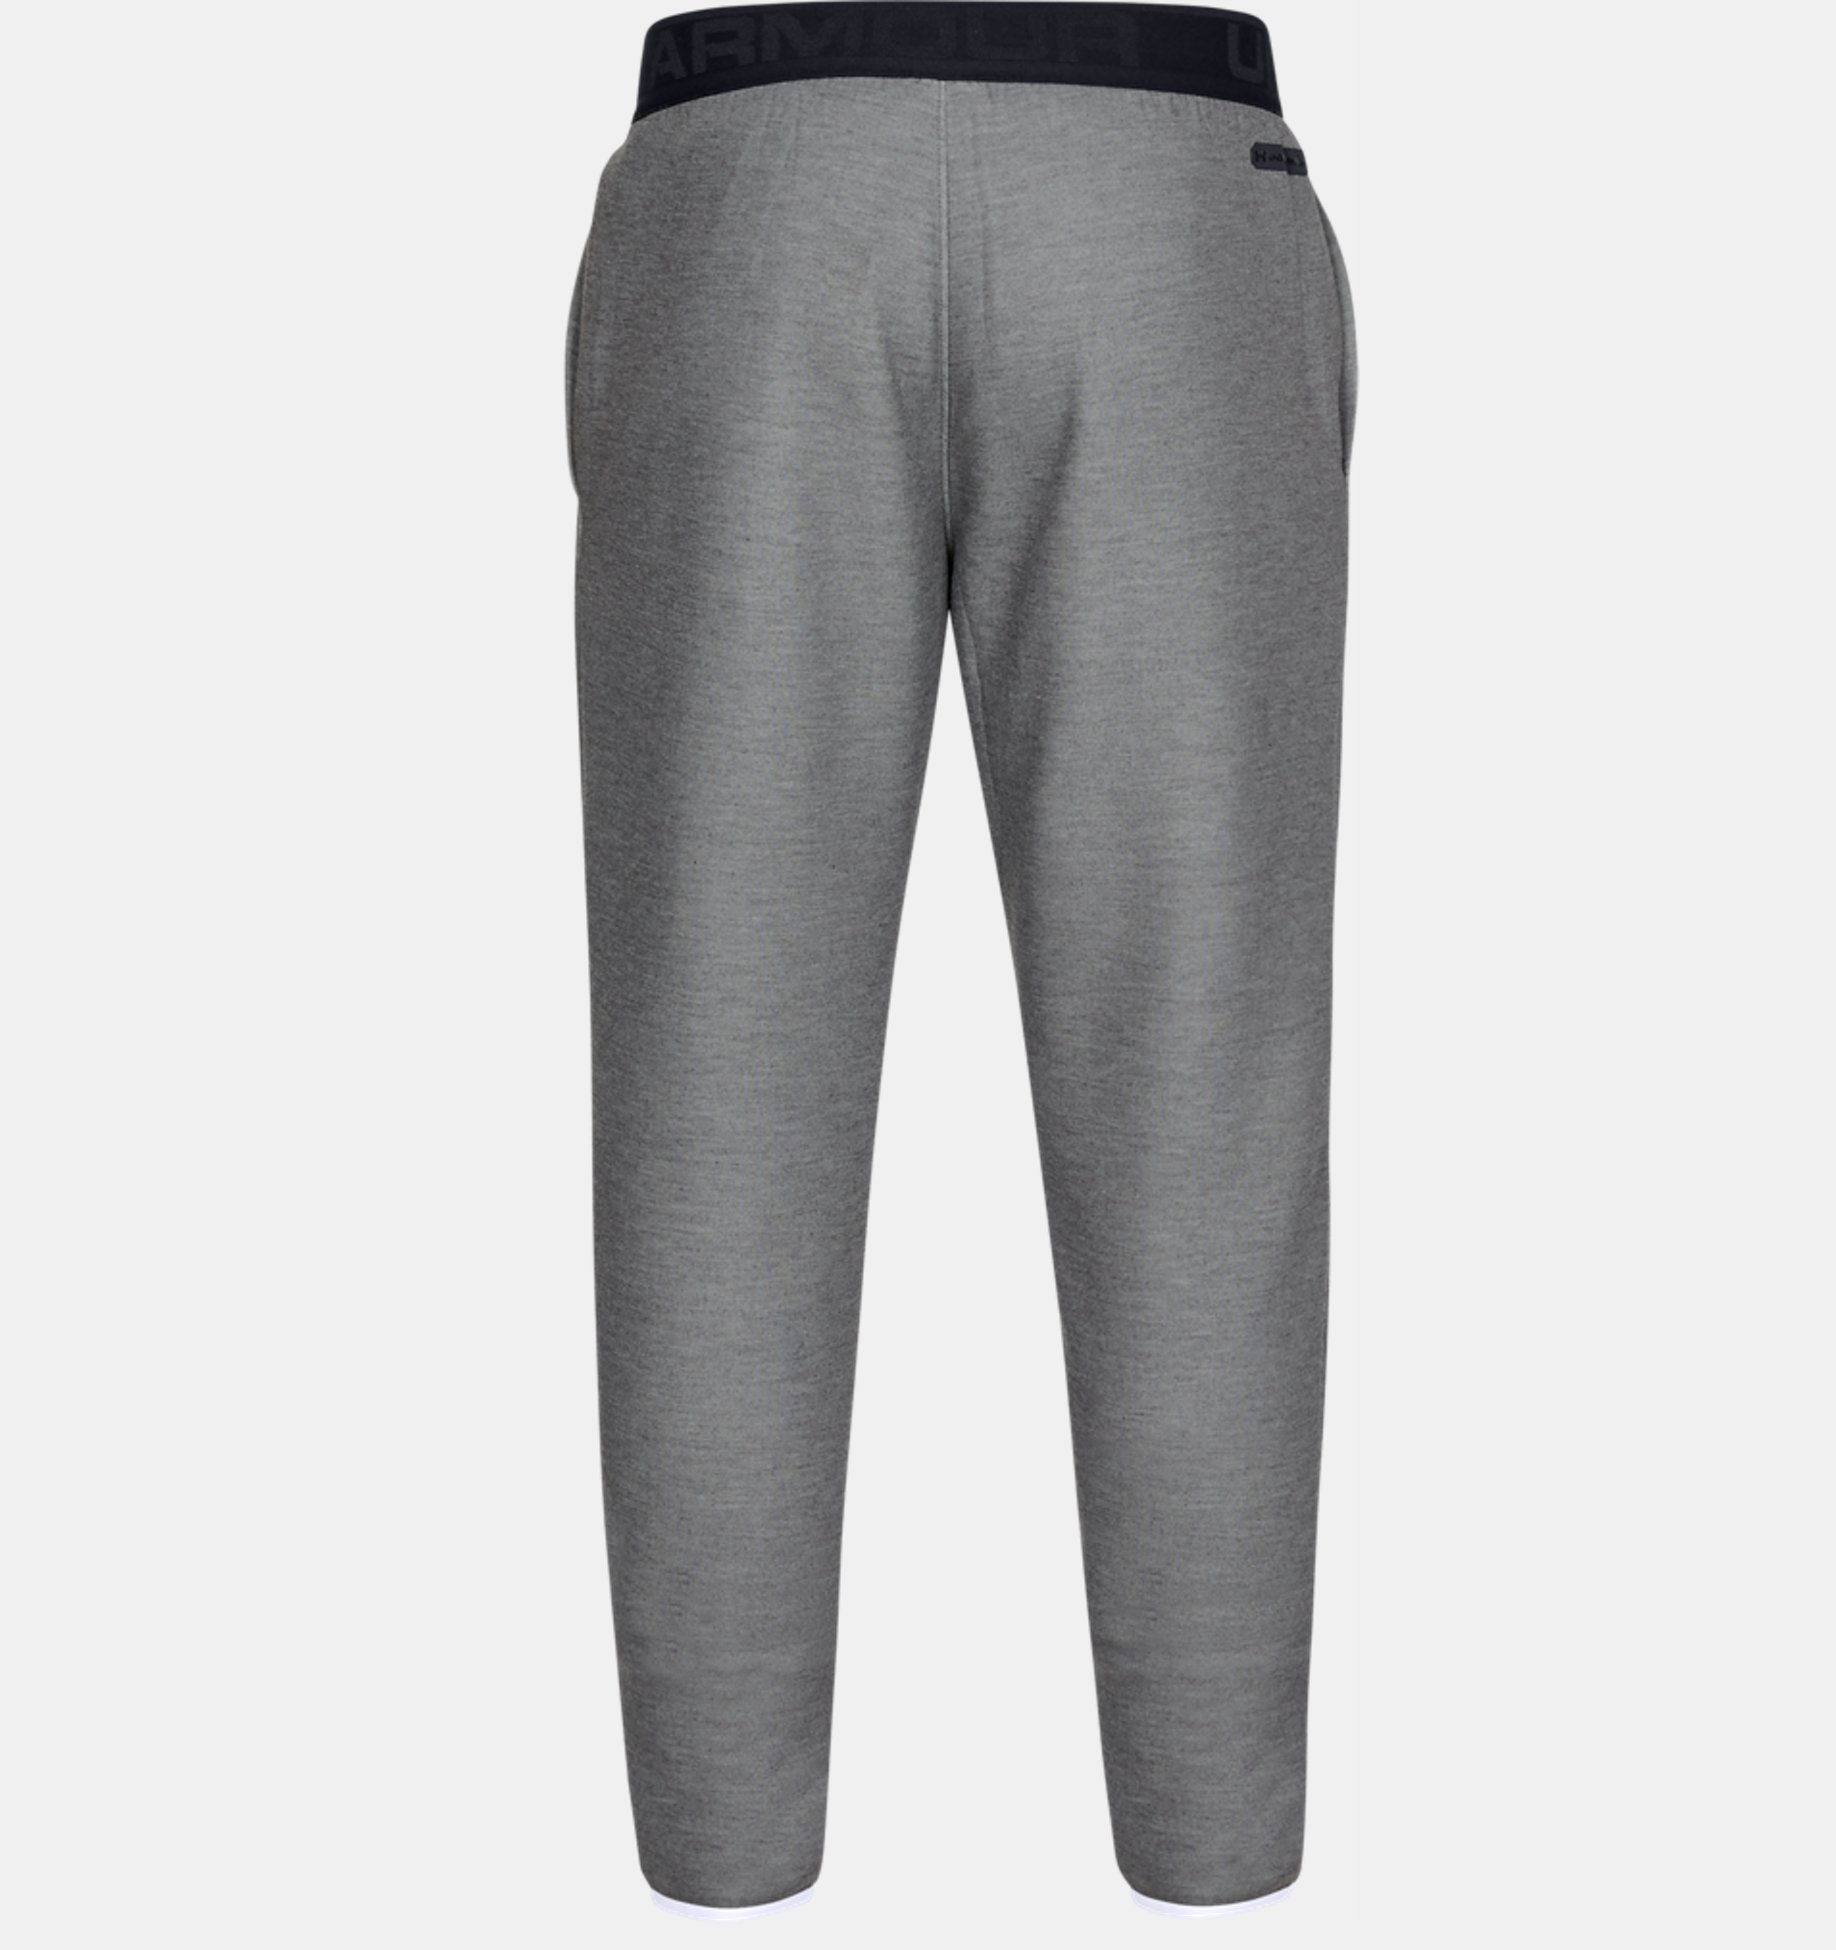 a6a29c52411 Pantalones de Entrenamiento UA Unstoppable Move para Hombre | Under ...